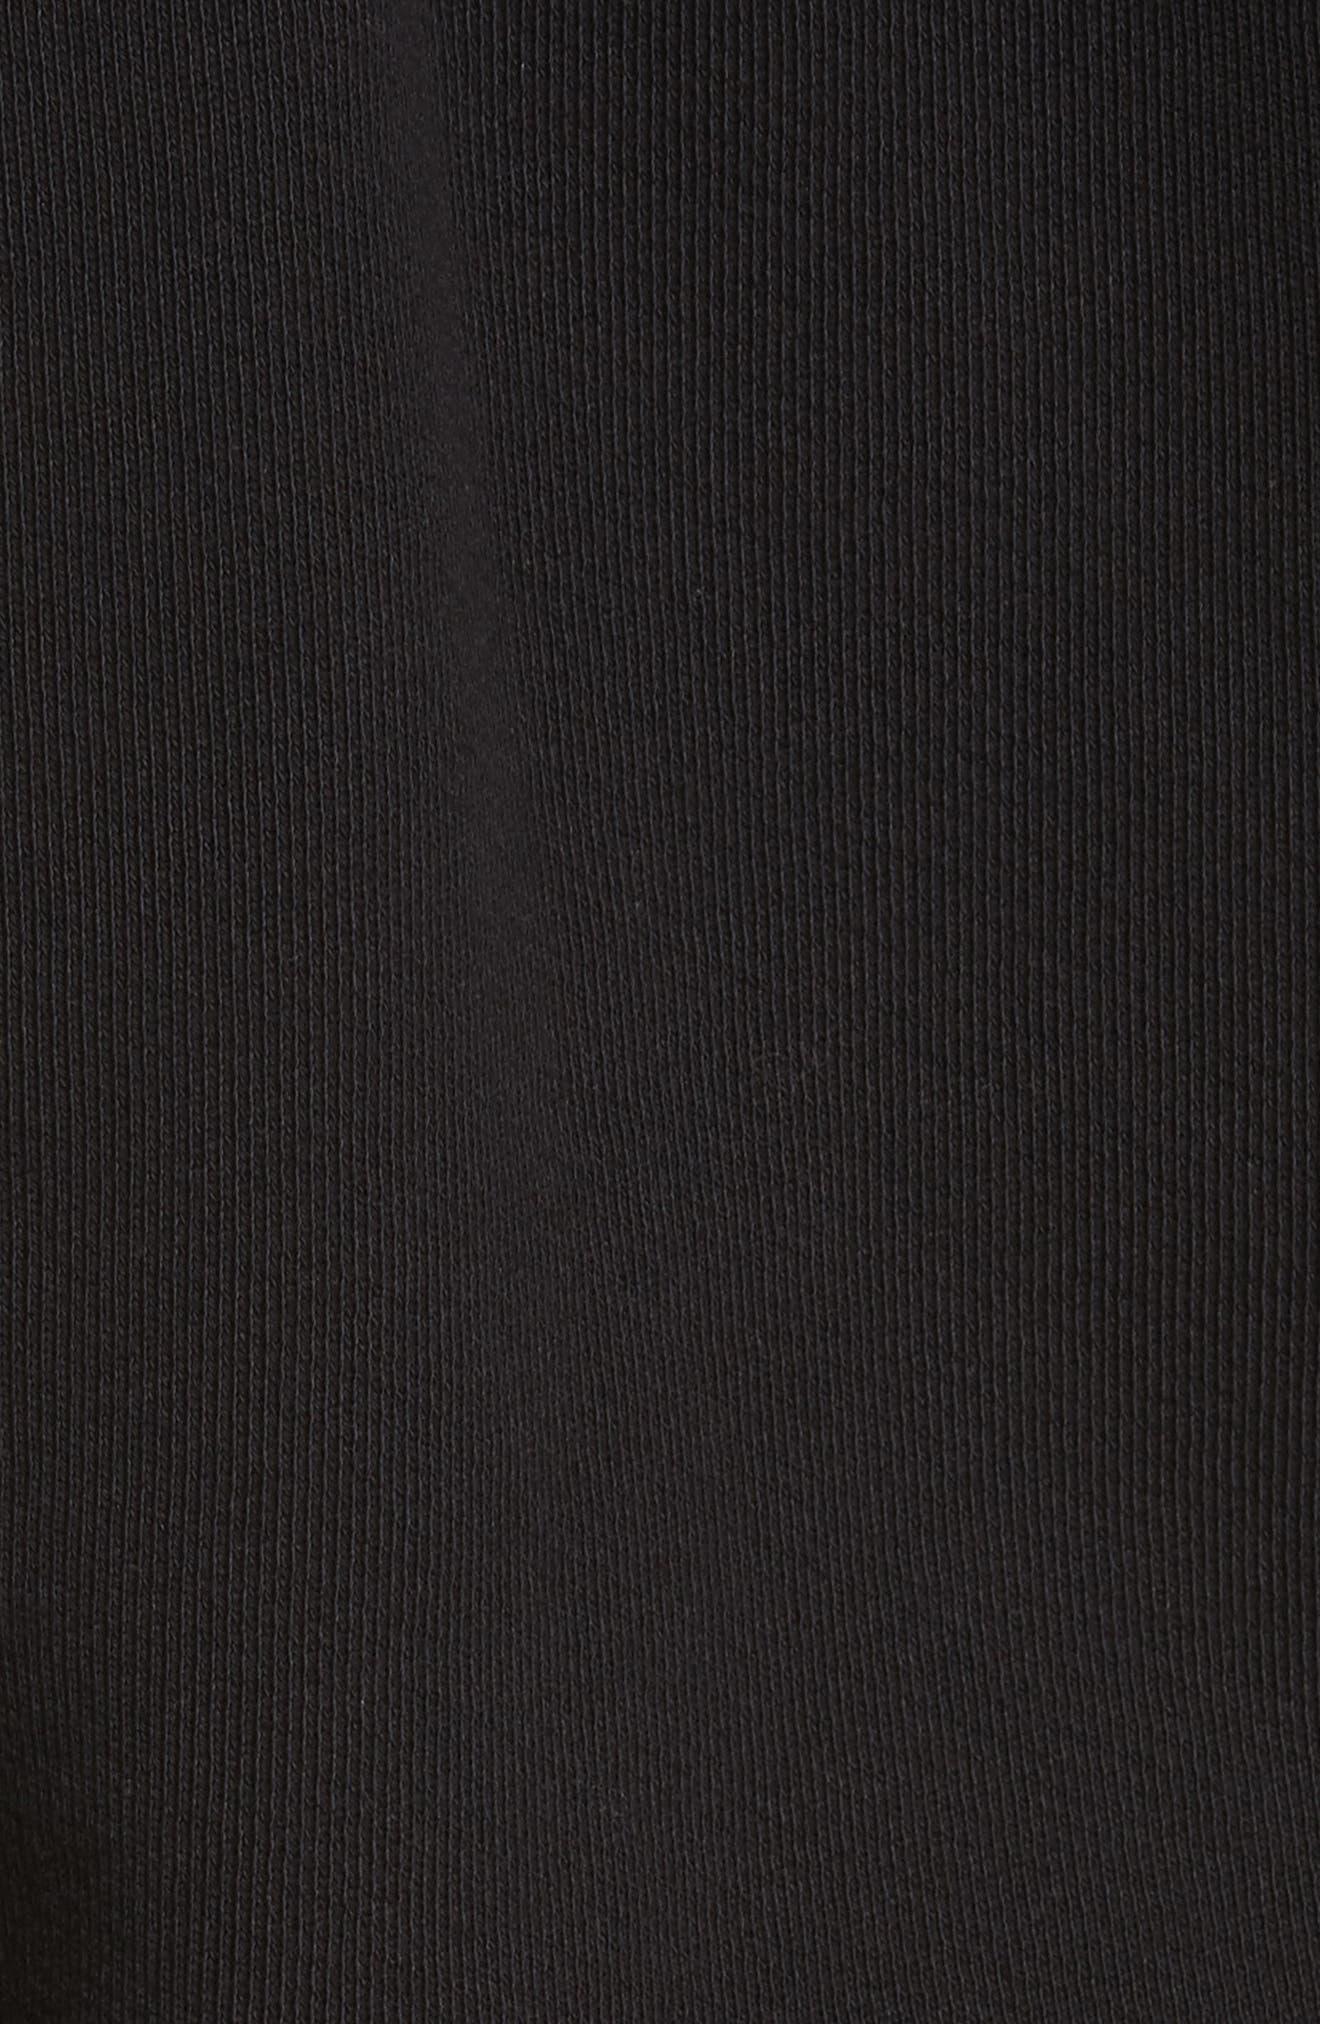 Shrunken Cotton Sweatshirt,                             Alternate thumbnail 5, color,                             Black